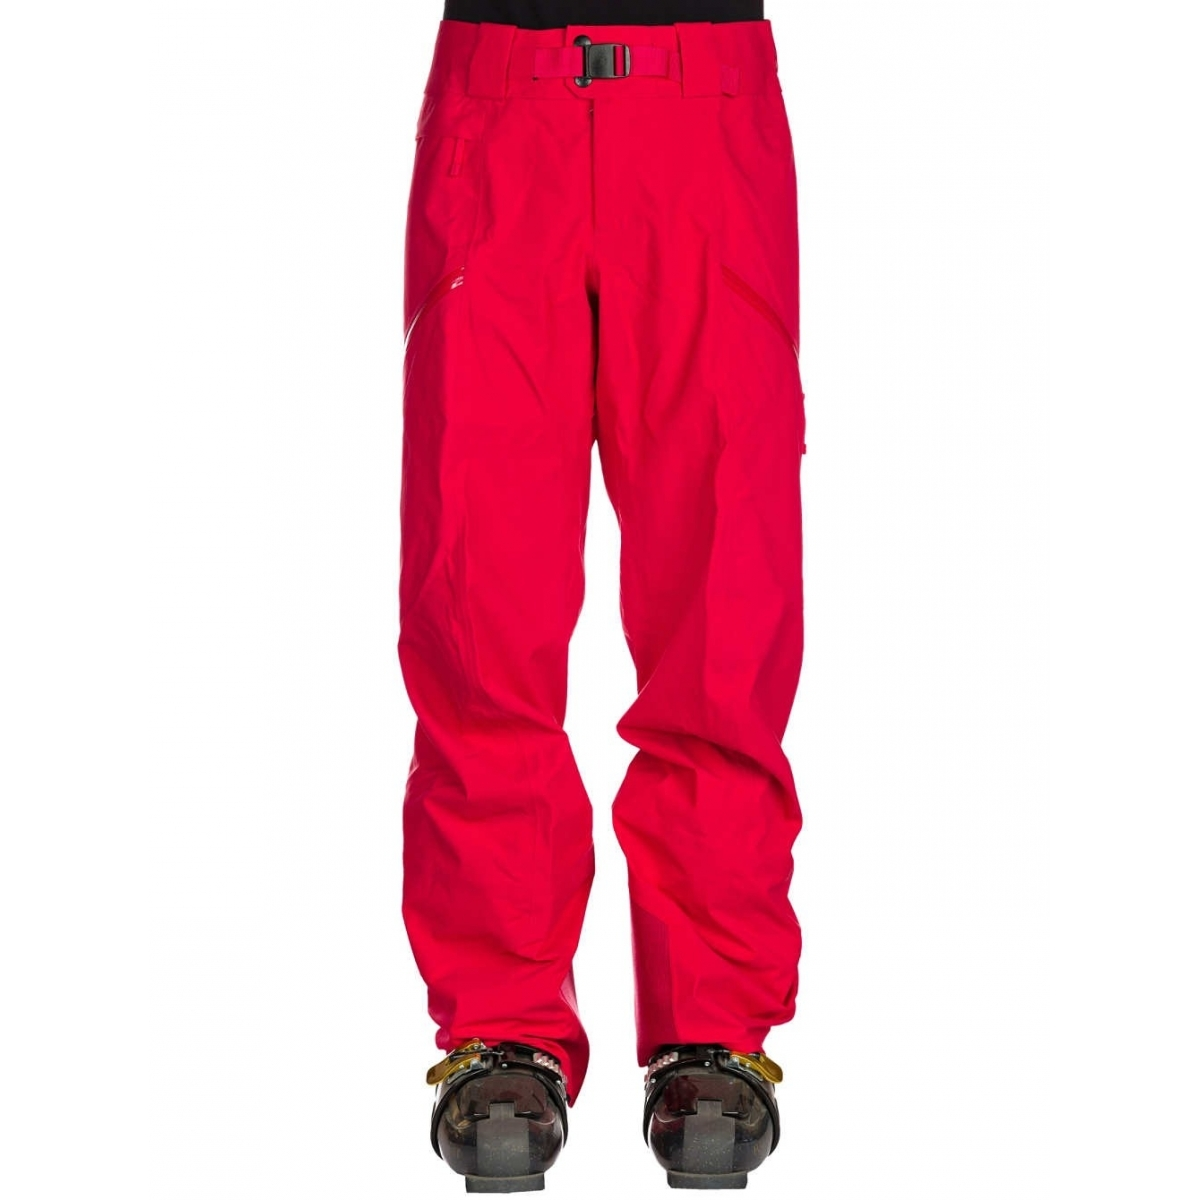 15f346738354eb Pantalon De Ski Arc'teryx Sentinel Pant Flamenco | Alltricks.com